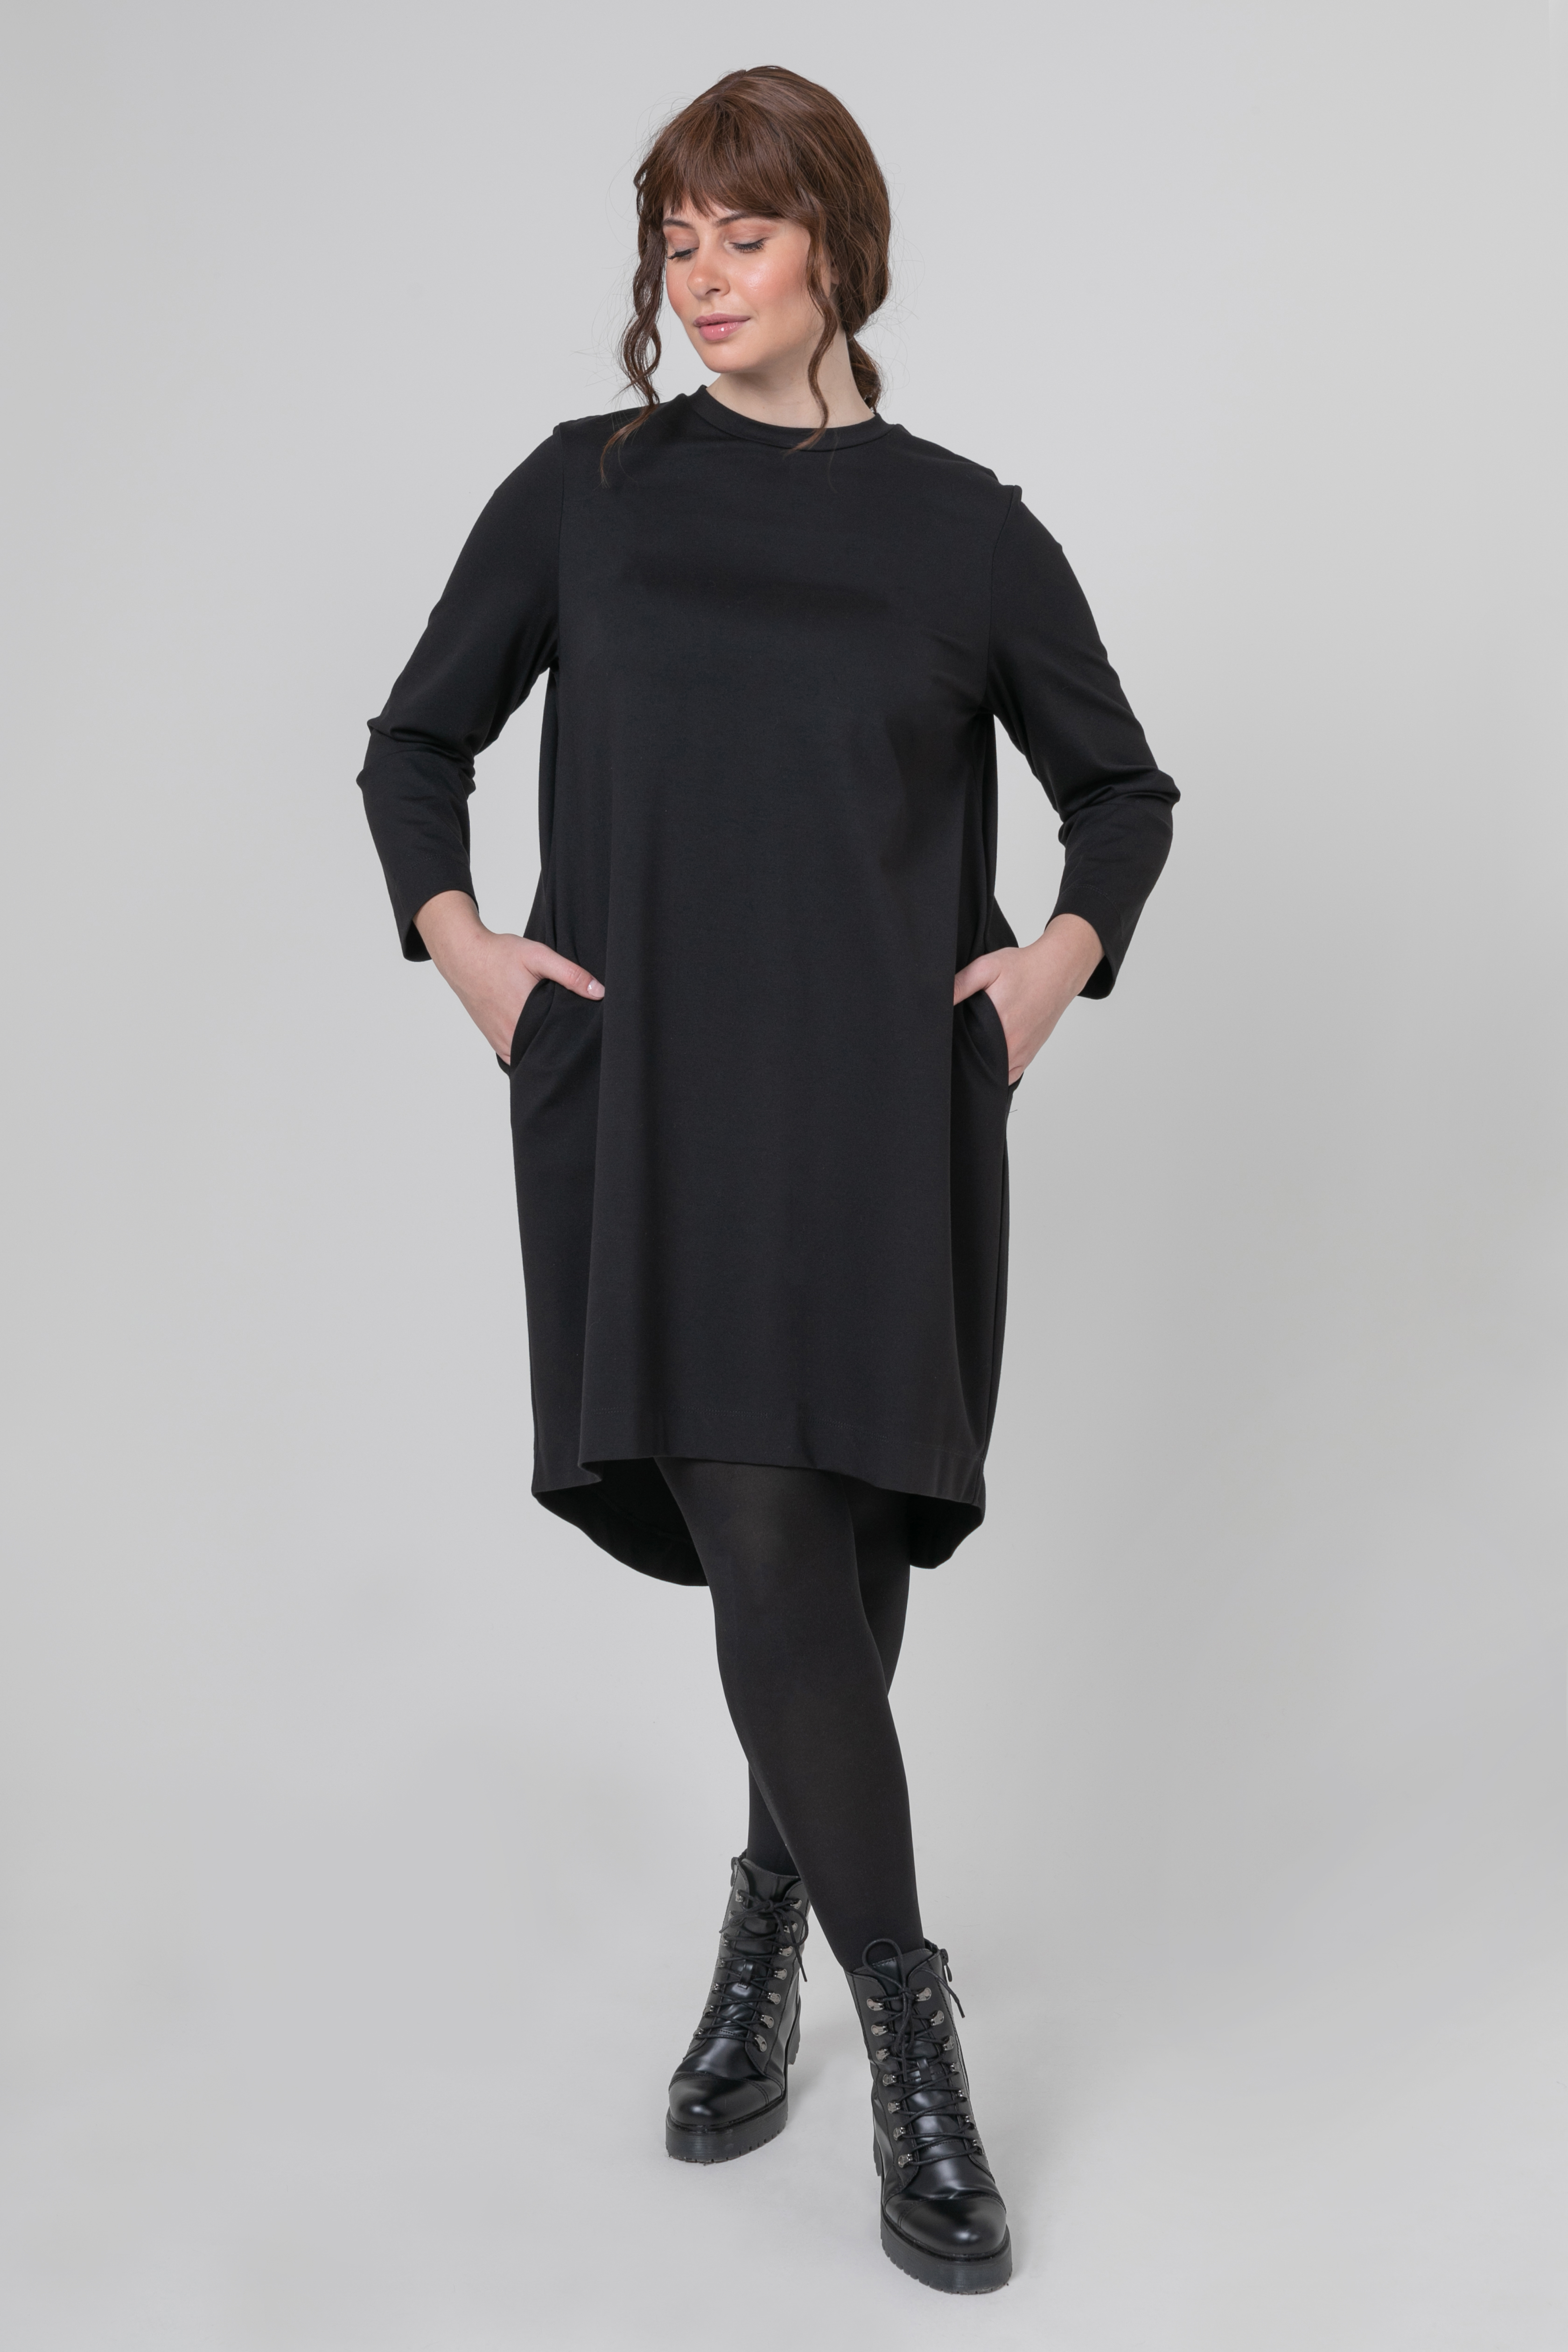 Mat fashion tuniek voor knielang